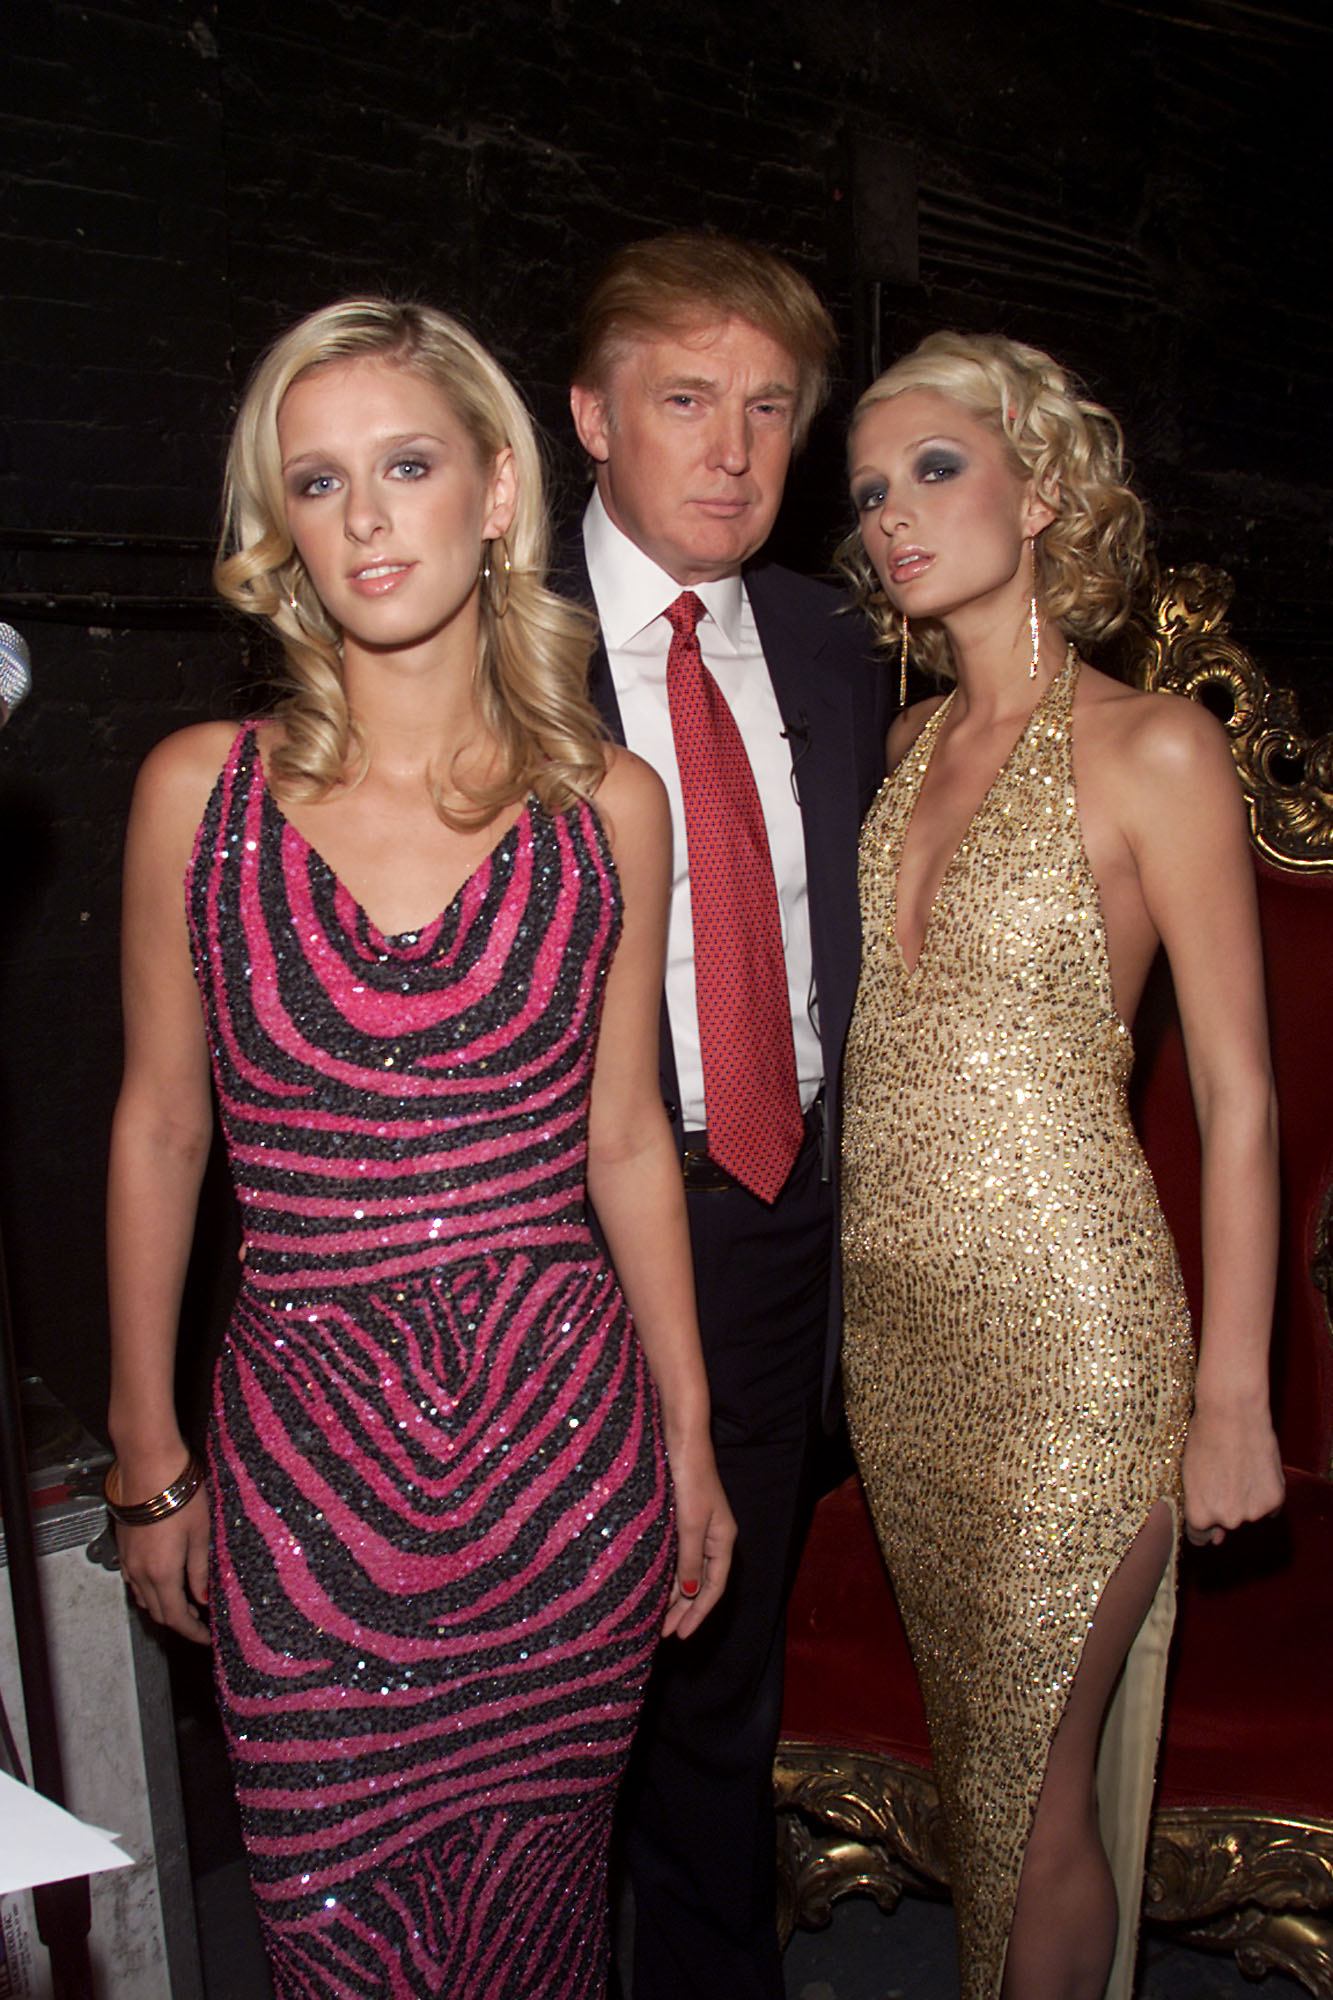 Niña follada por trans porno Melania Enseno A Trump El Video Sexual De Paris Hilton Asi Comenzo Una Obsesion